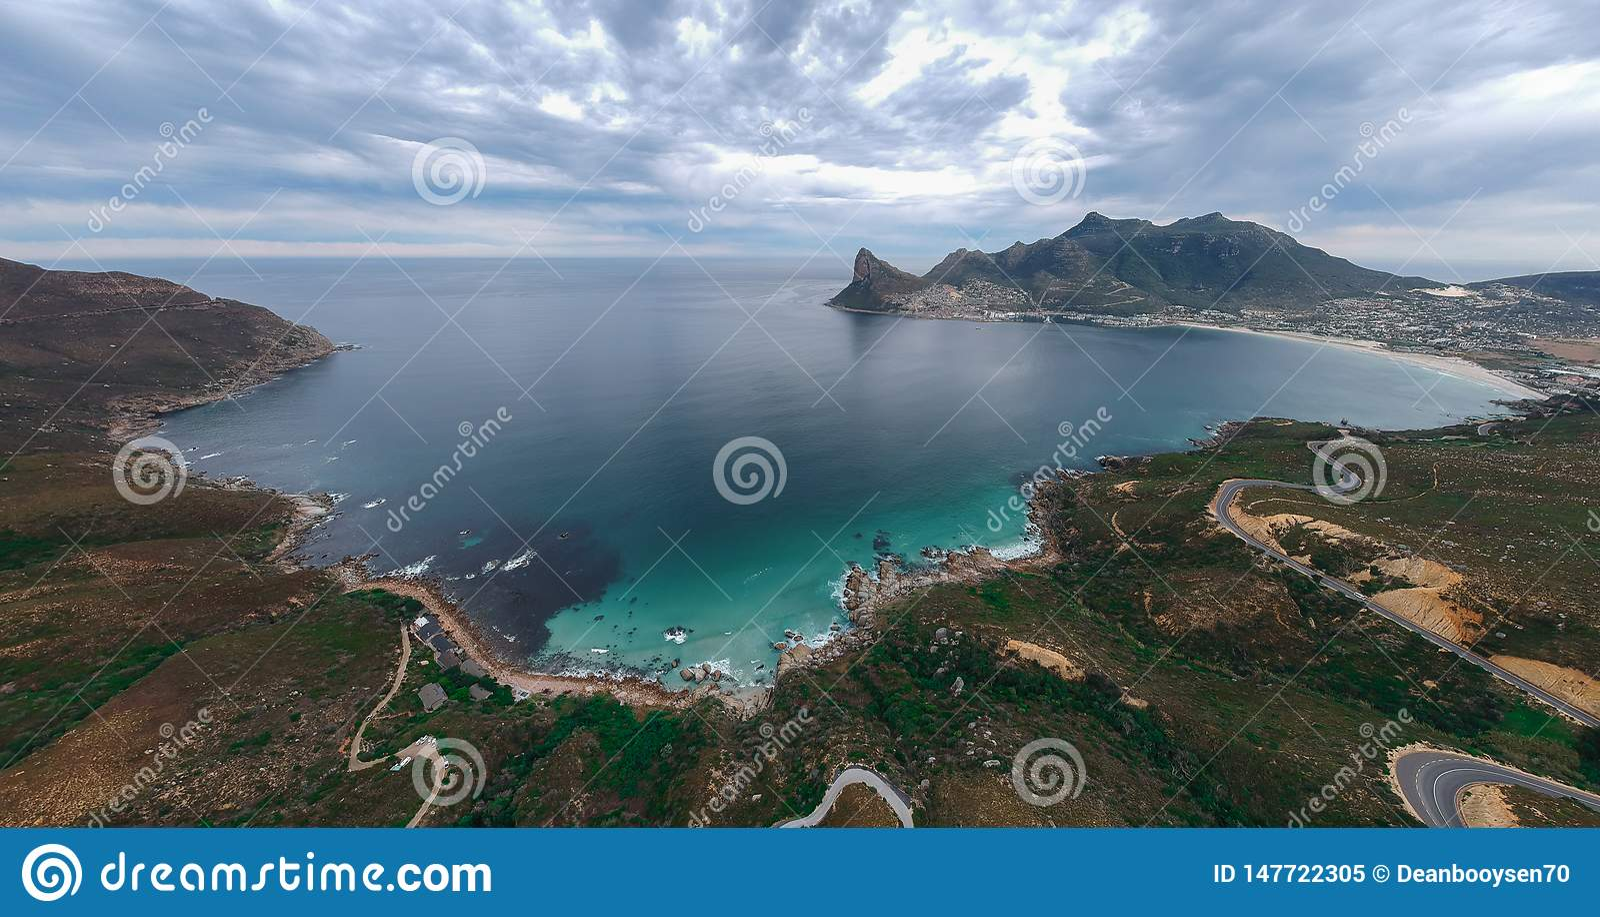 Baía de Hout, cabo ocidental, África do Sul